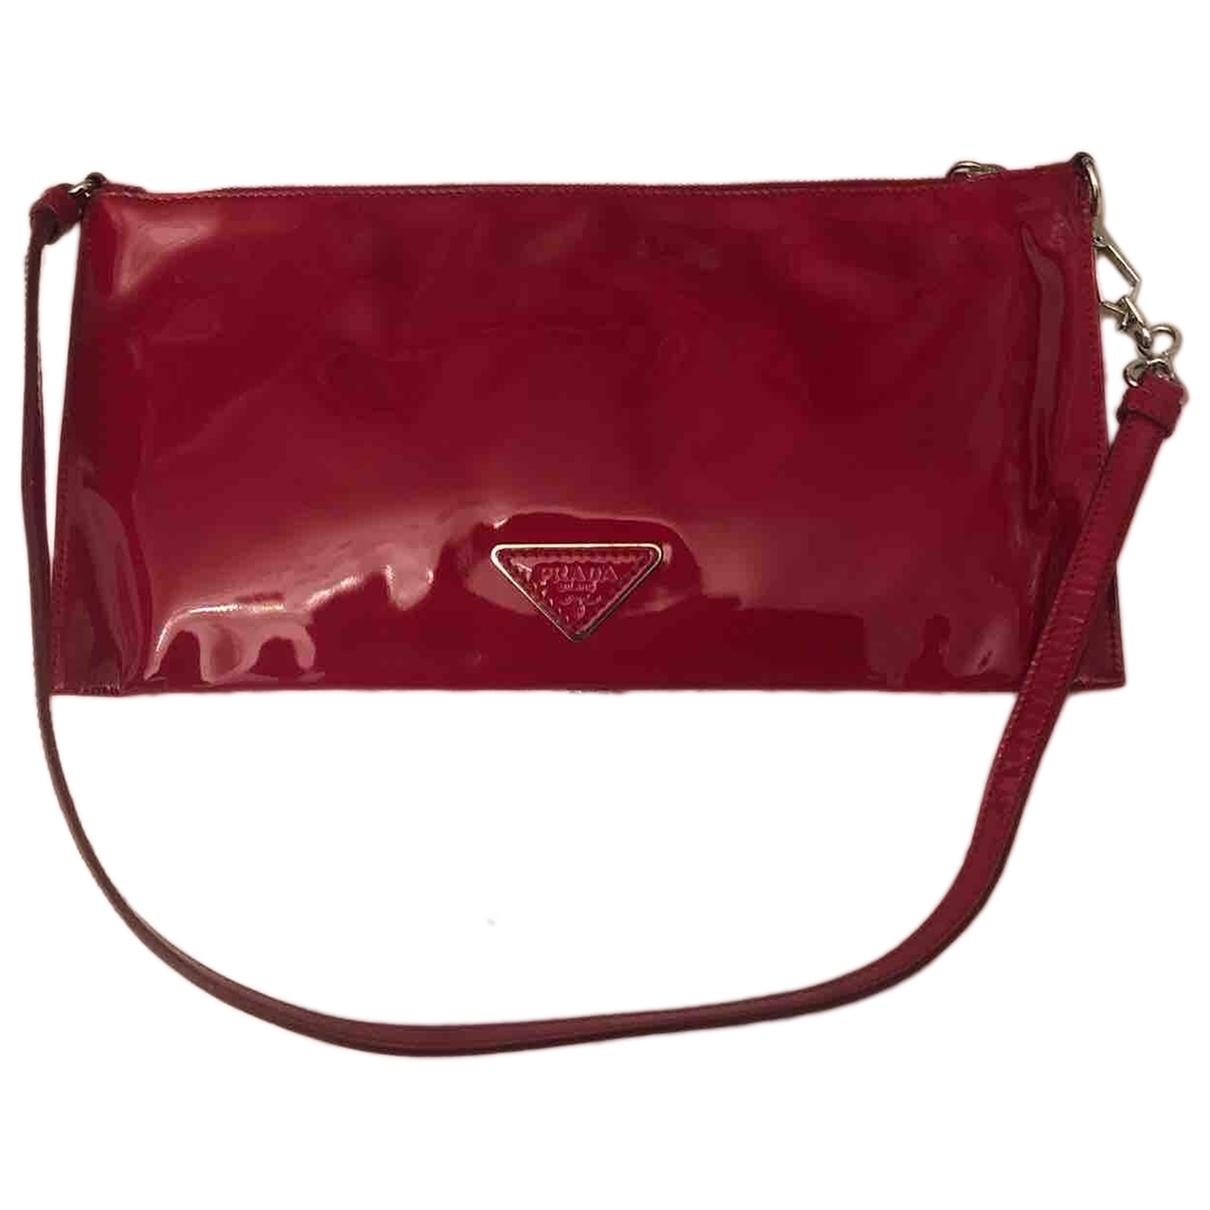 Prada \N Red Patent leather Clutch bag for Women \N